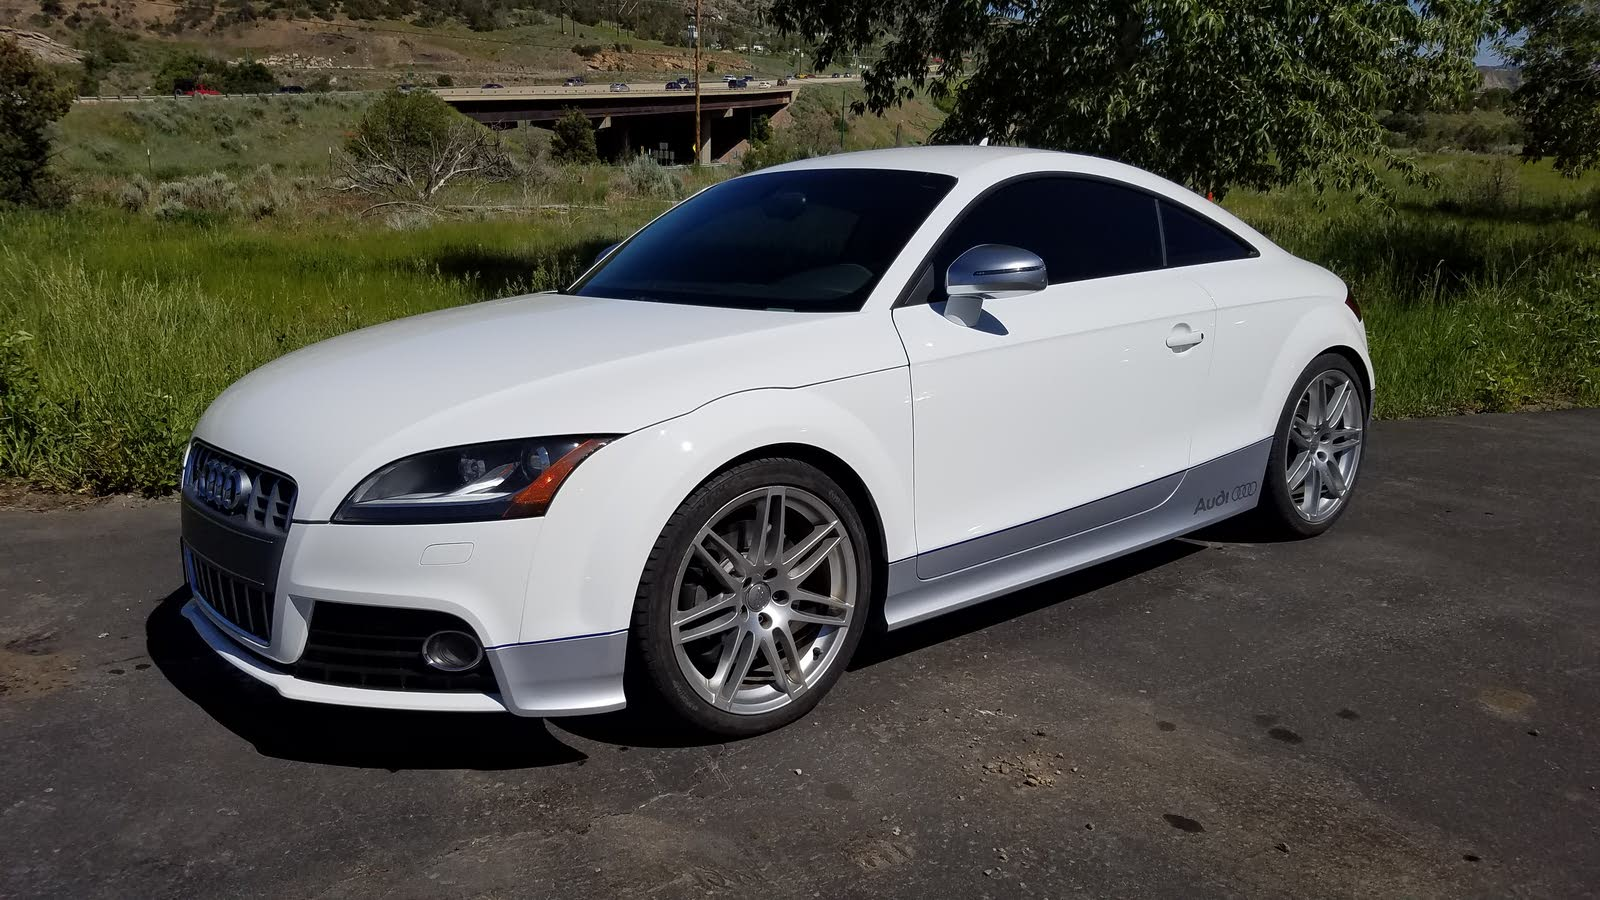 2009 Audi TTS Test Drive Review - CarGurus